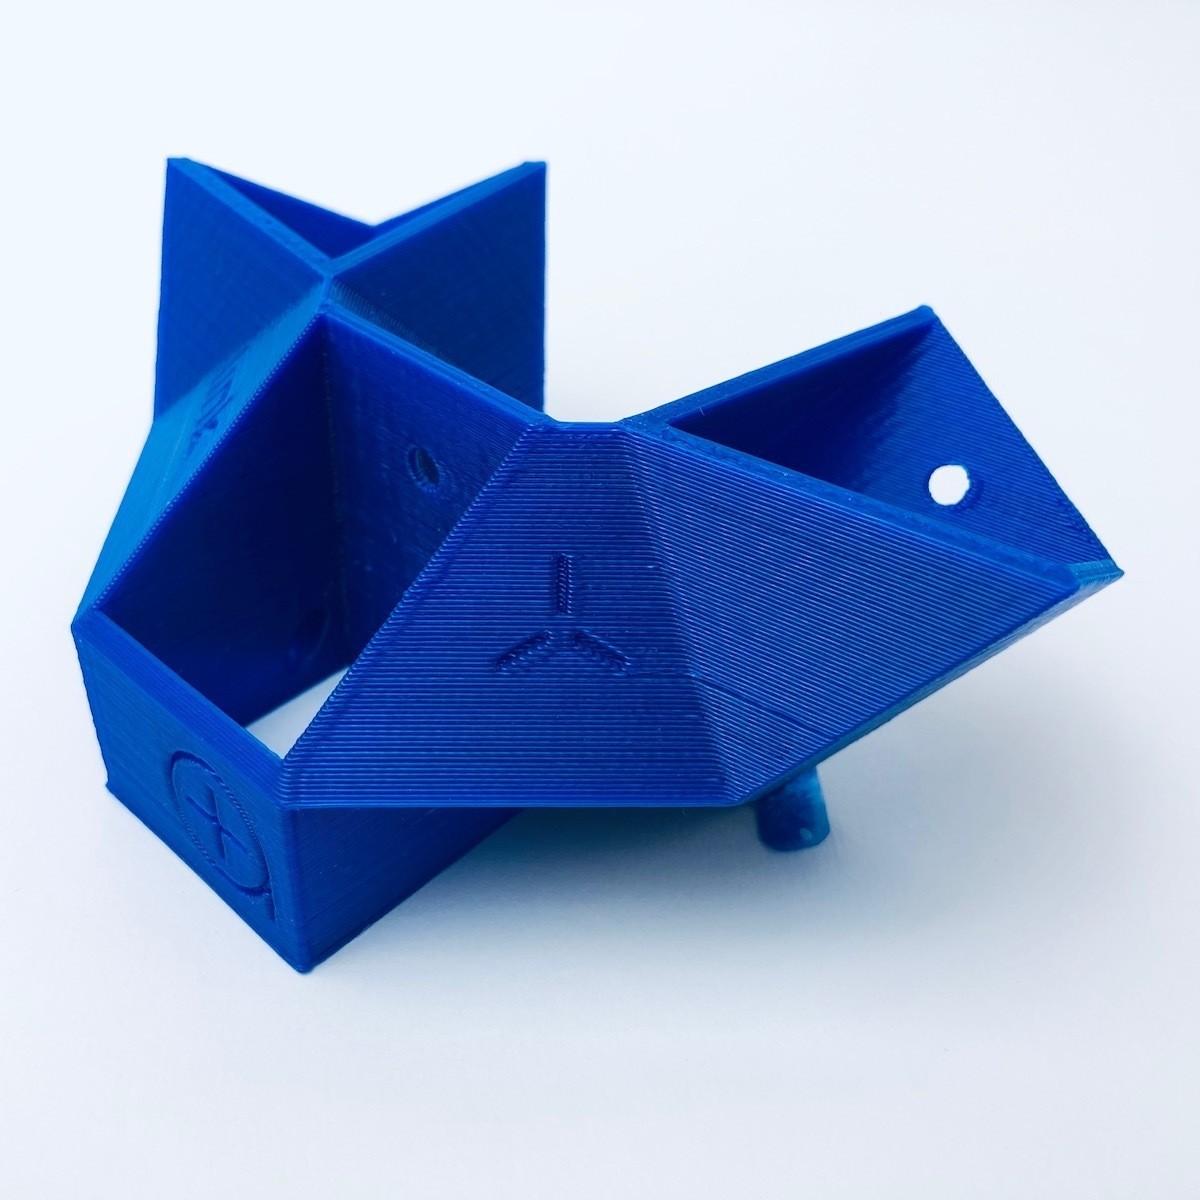 link_photos_Cults_08.jpg Download free STL file link • 3D print template, antoine_taillandier_studio